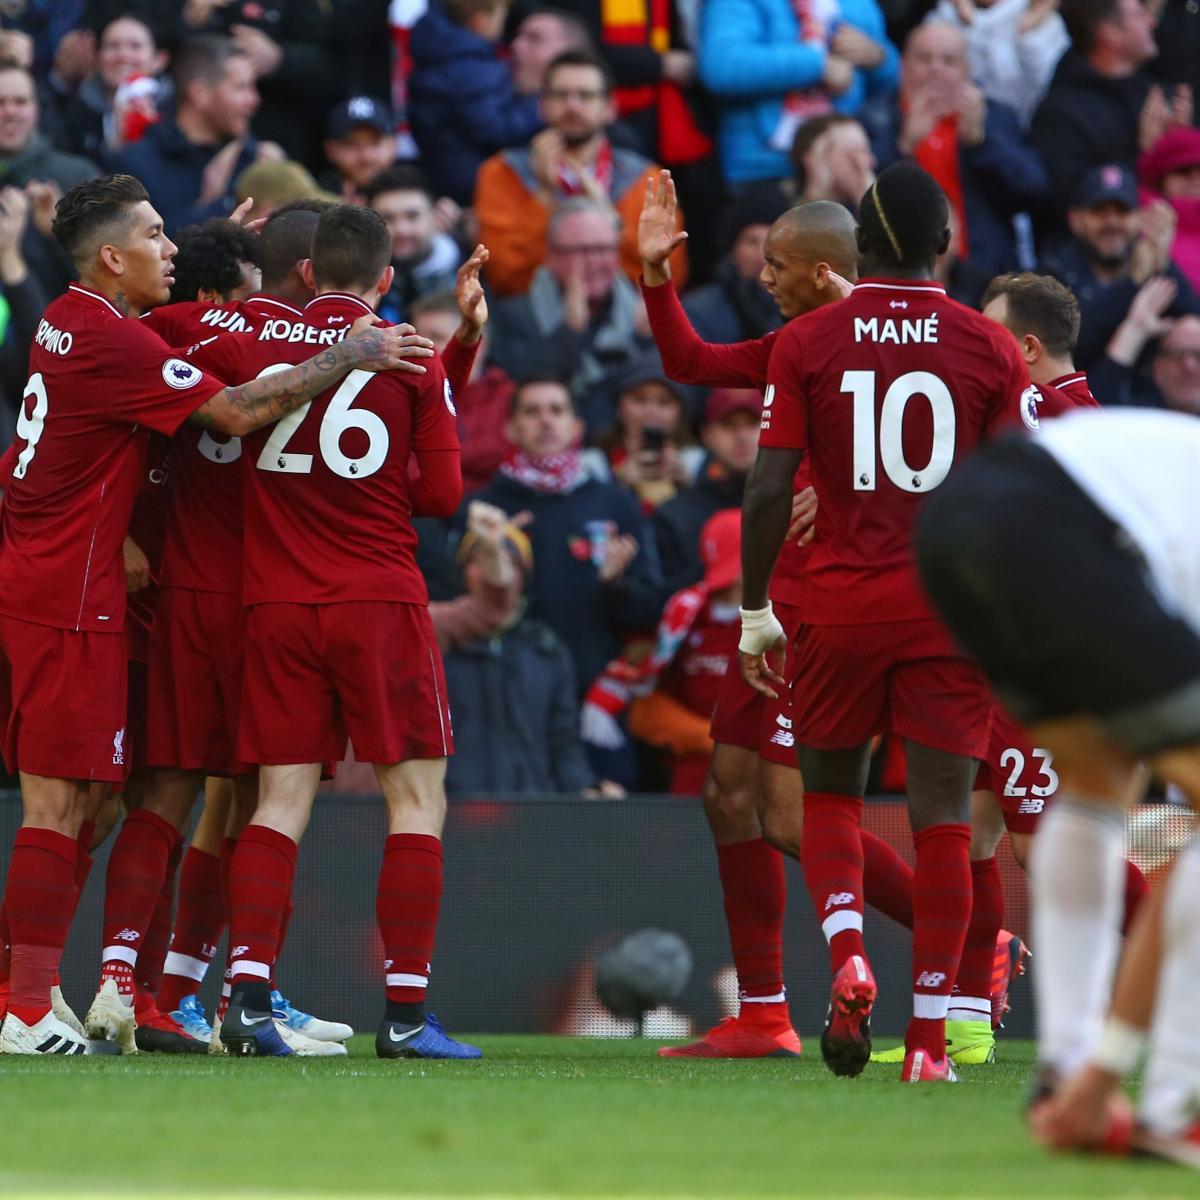 Live Streaming Soccer News Liverpool Vs Benfica Live: Watford Vs. Liverpool: Odds, Preview, Live Stream, TV Info